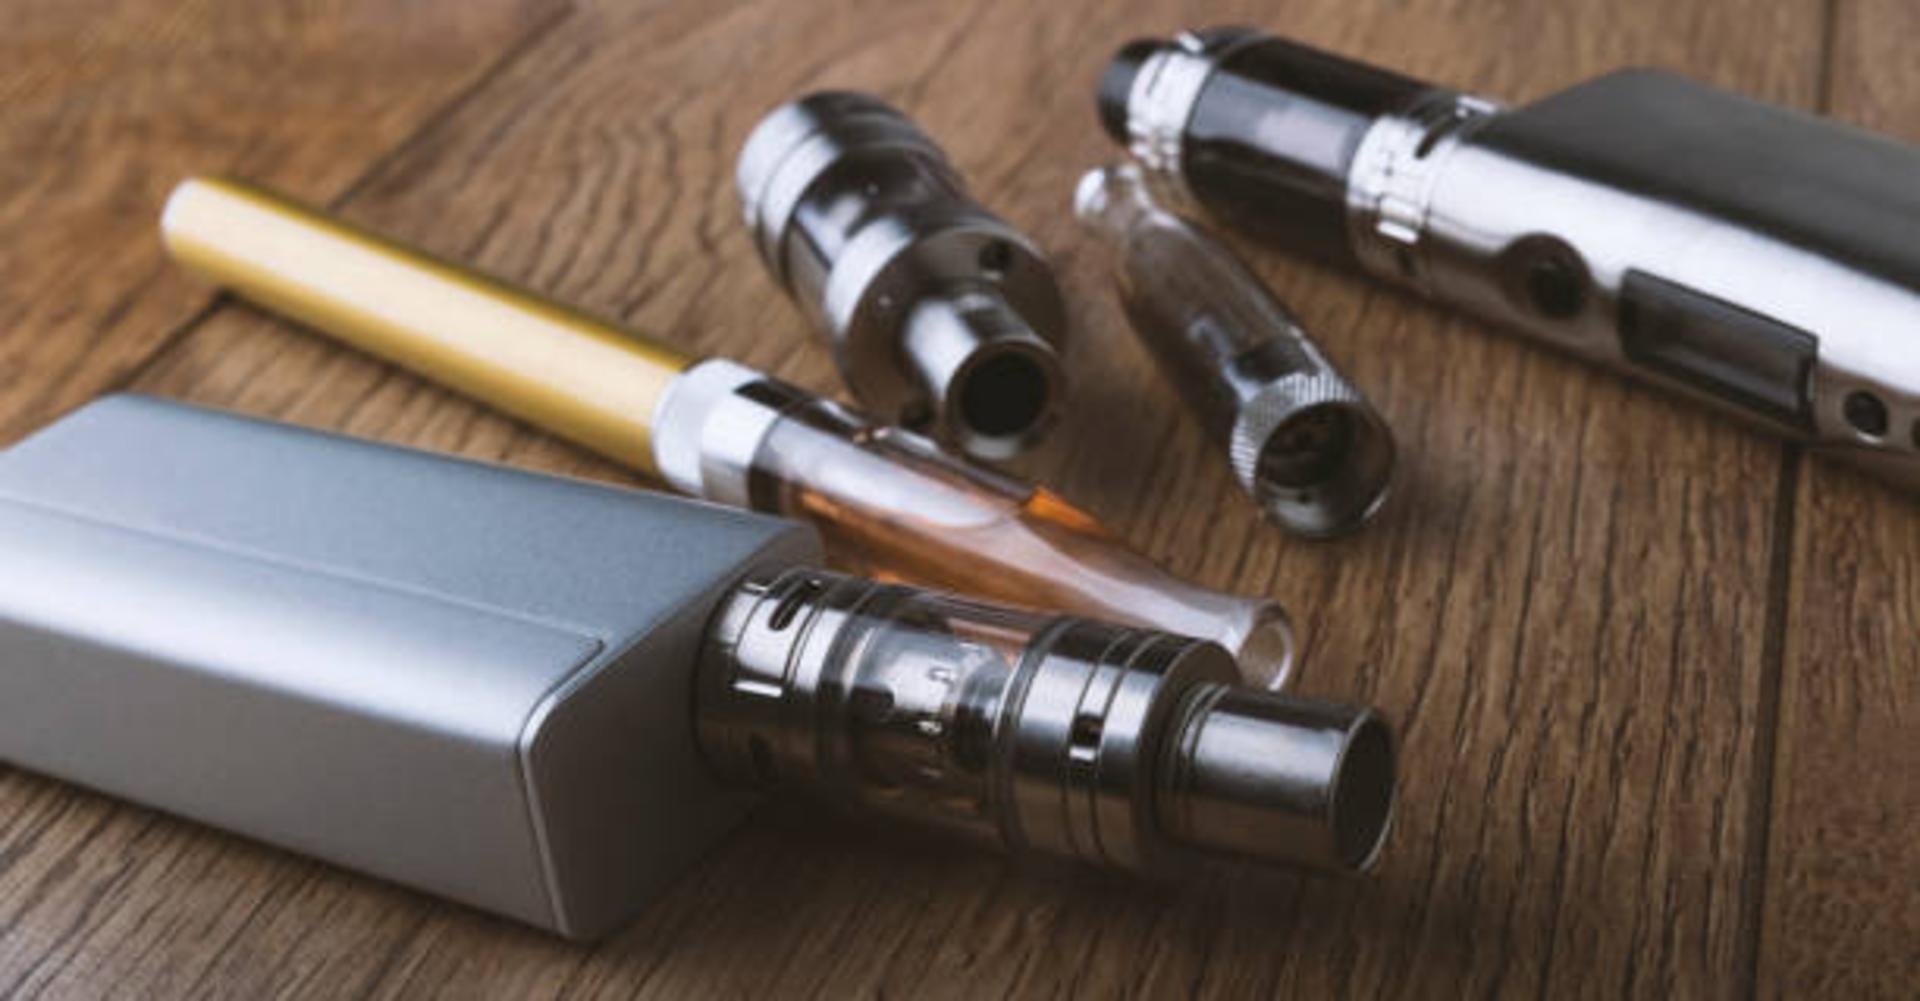 The Vape Pen (Disposable Electronic Cigarette) Read Before You Buy!   newyorkvapeking